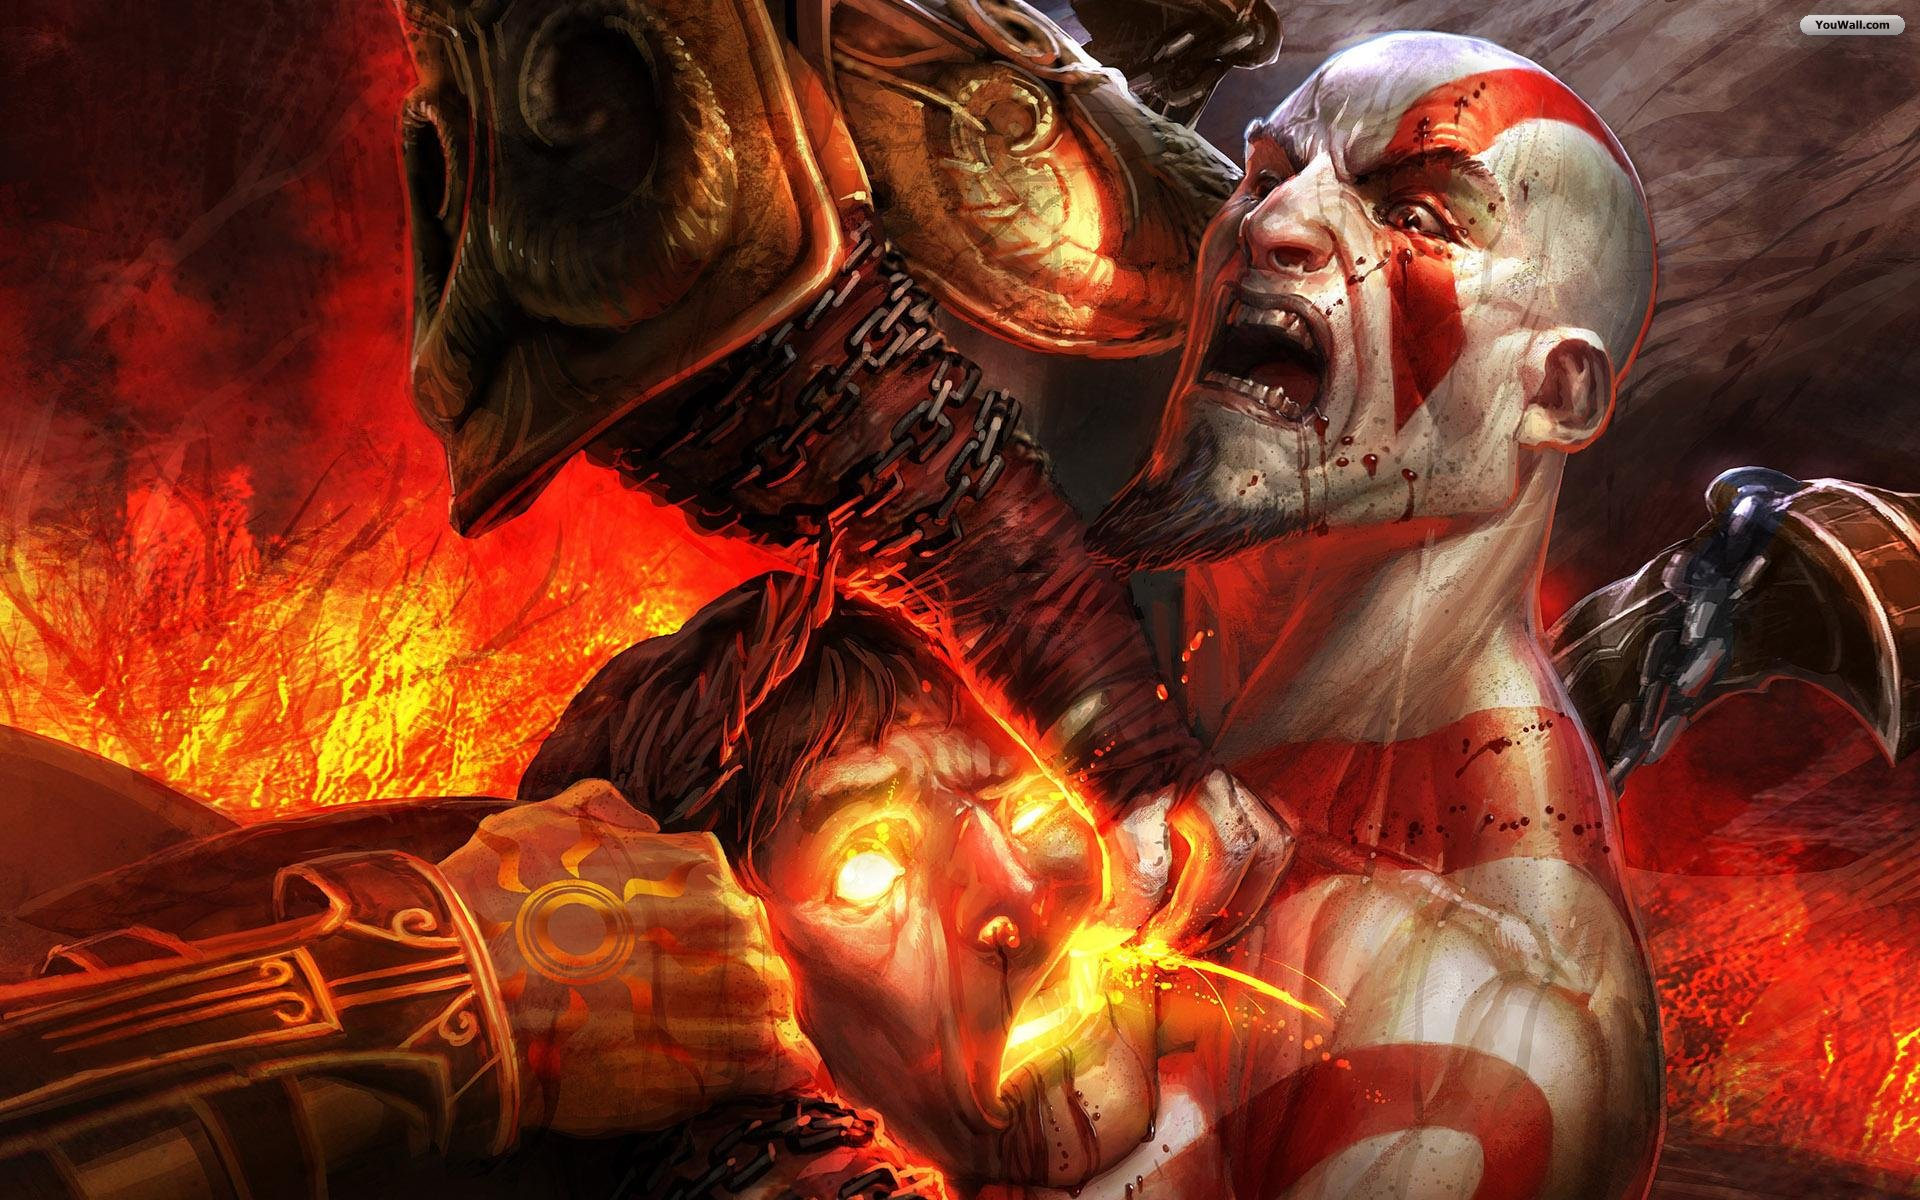 Free Download God Of War Wallpaper Hd 1080p Alojamiento De